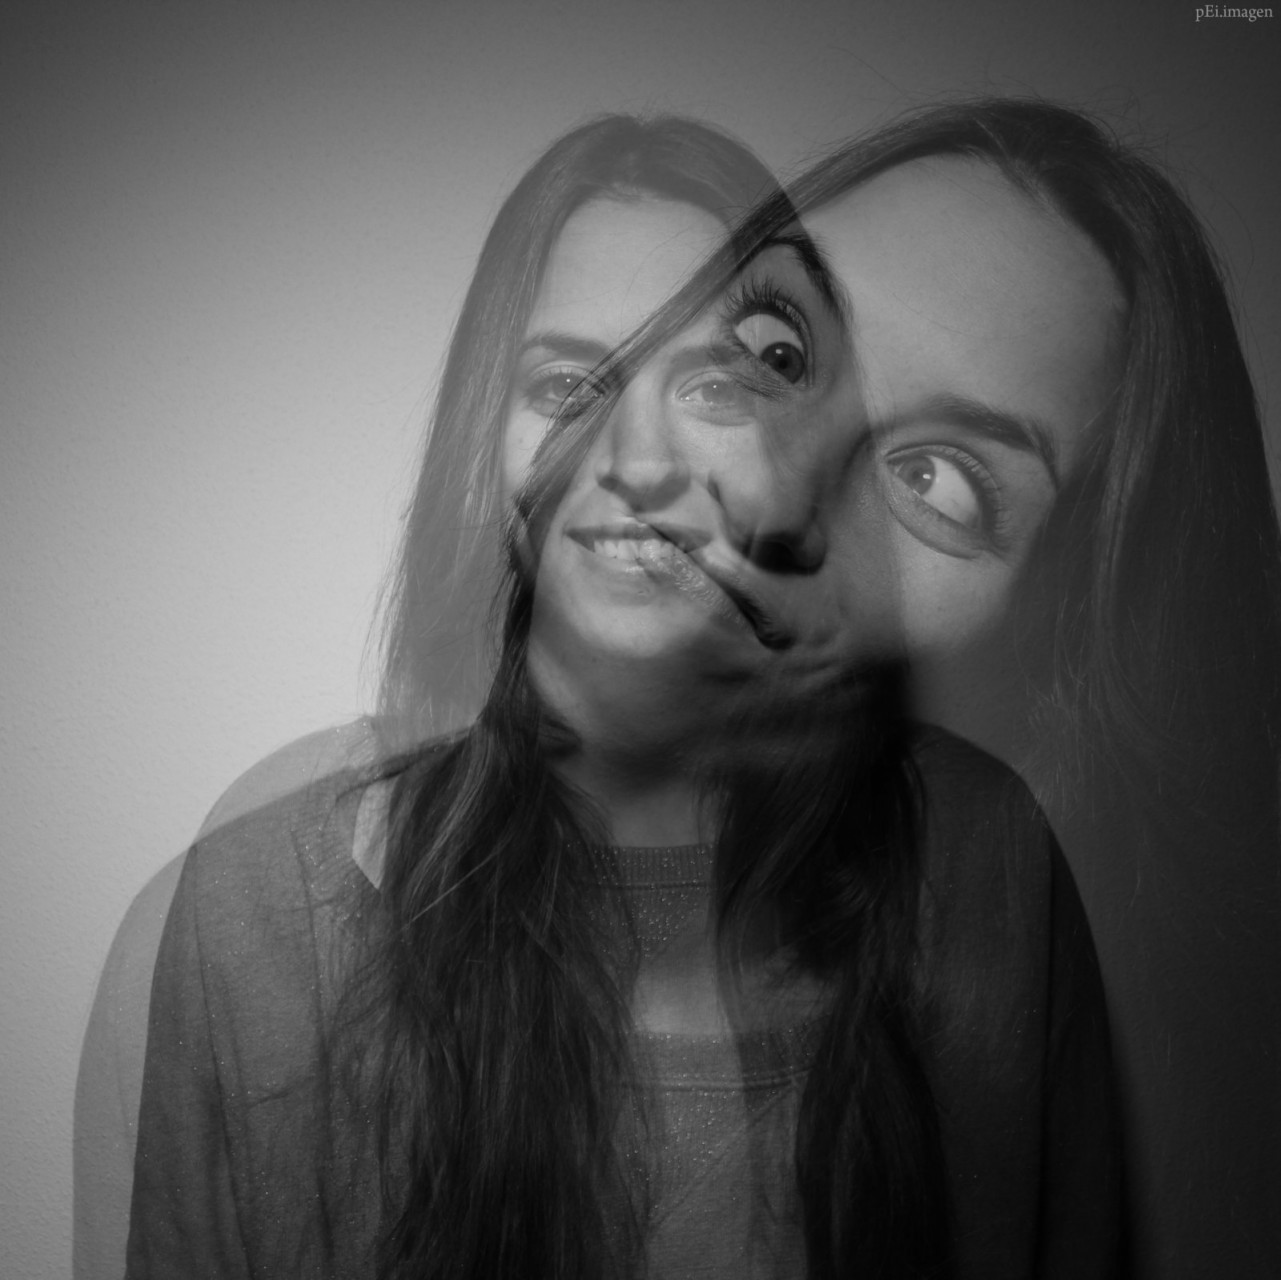 peipegata me myself I proyectos fotografia peipegatafotografia # 071  Sara Herrera